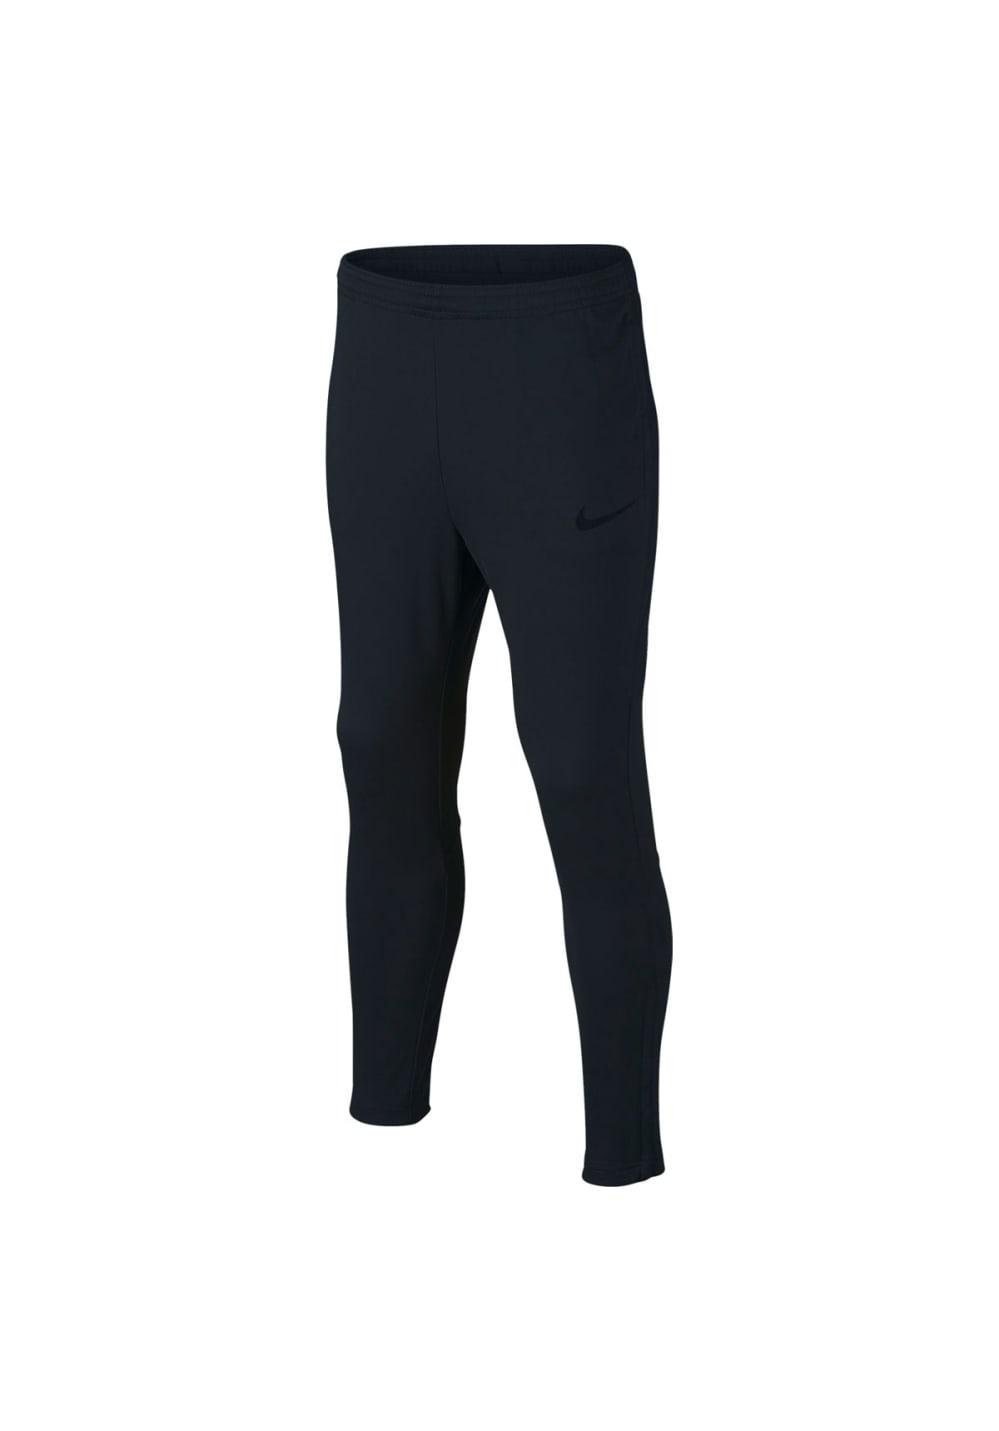 Nike Football Dry Fitness Pant Kids' Academy Pantalons Noir ChQrtxBsdo